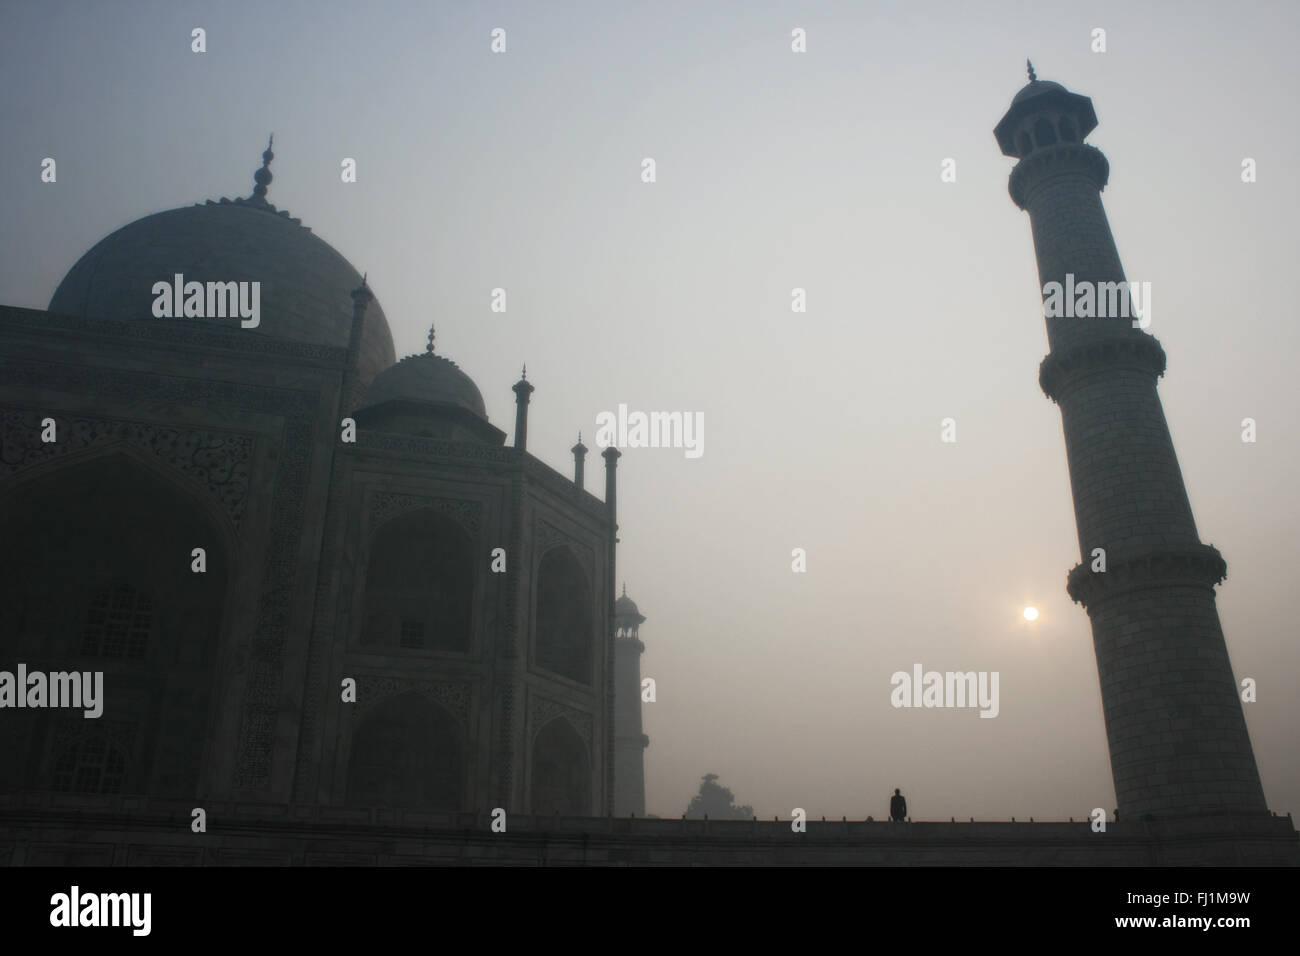 Taj Mahal in the early morning, Agra India - Stock Image